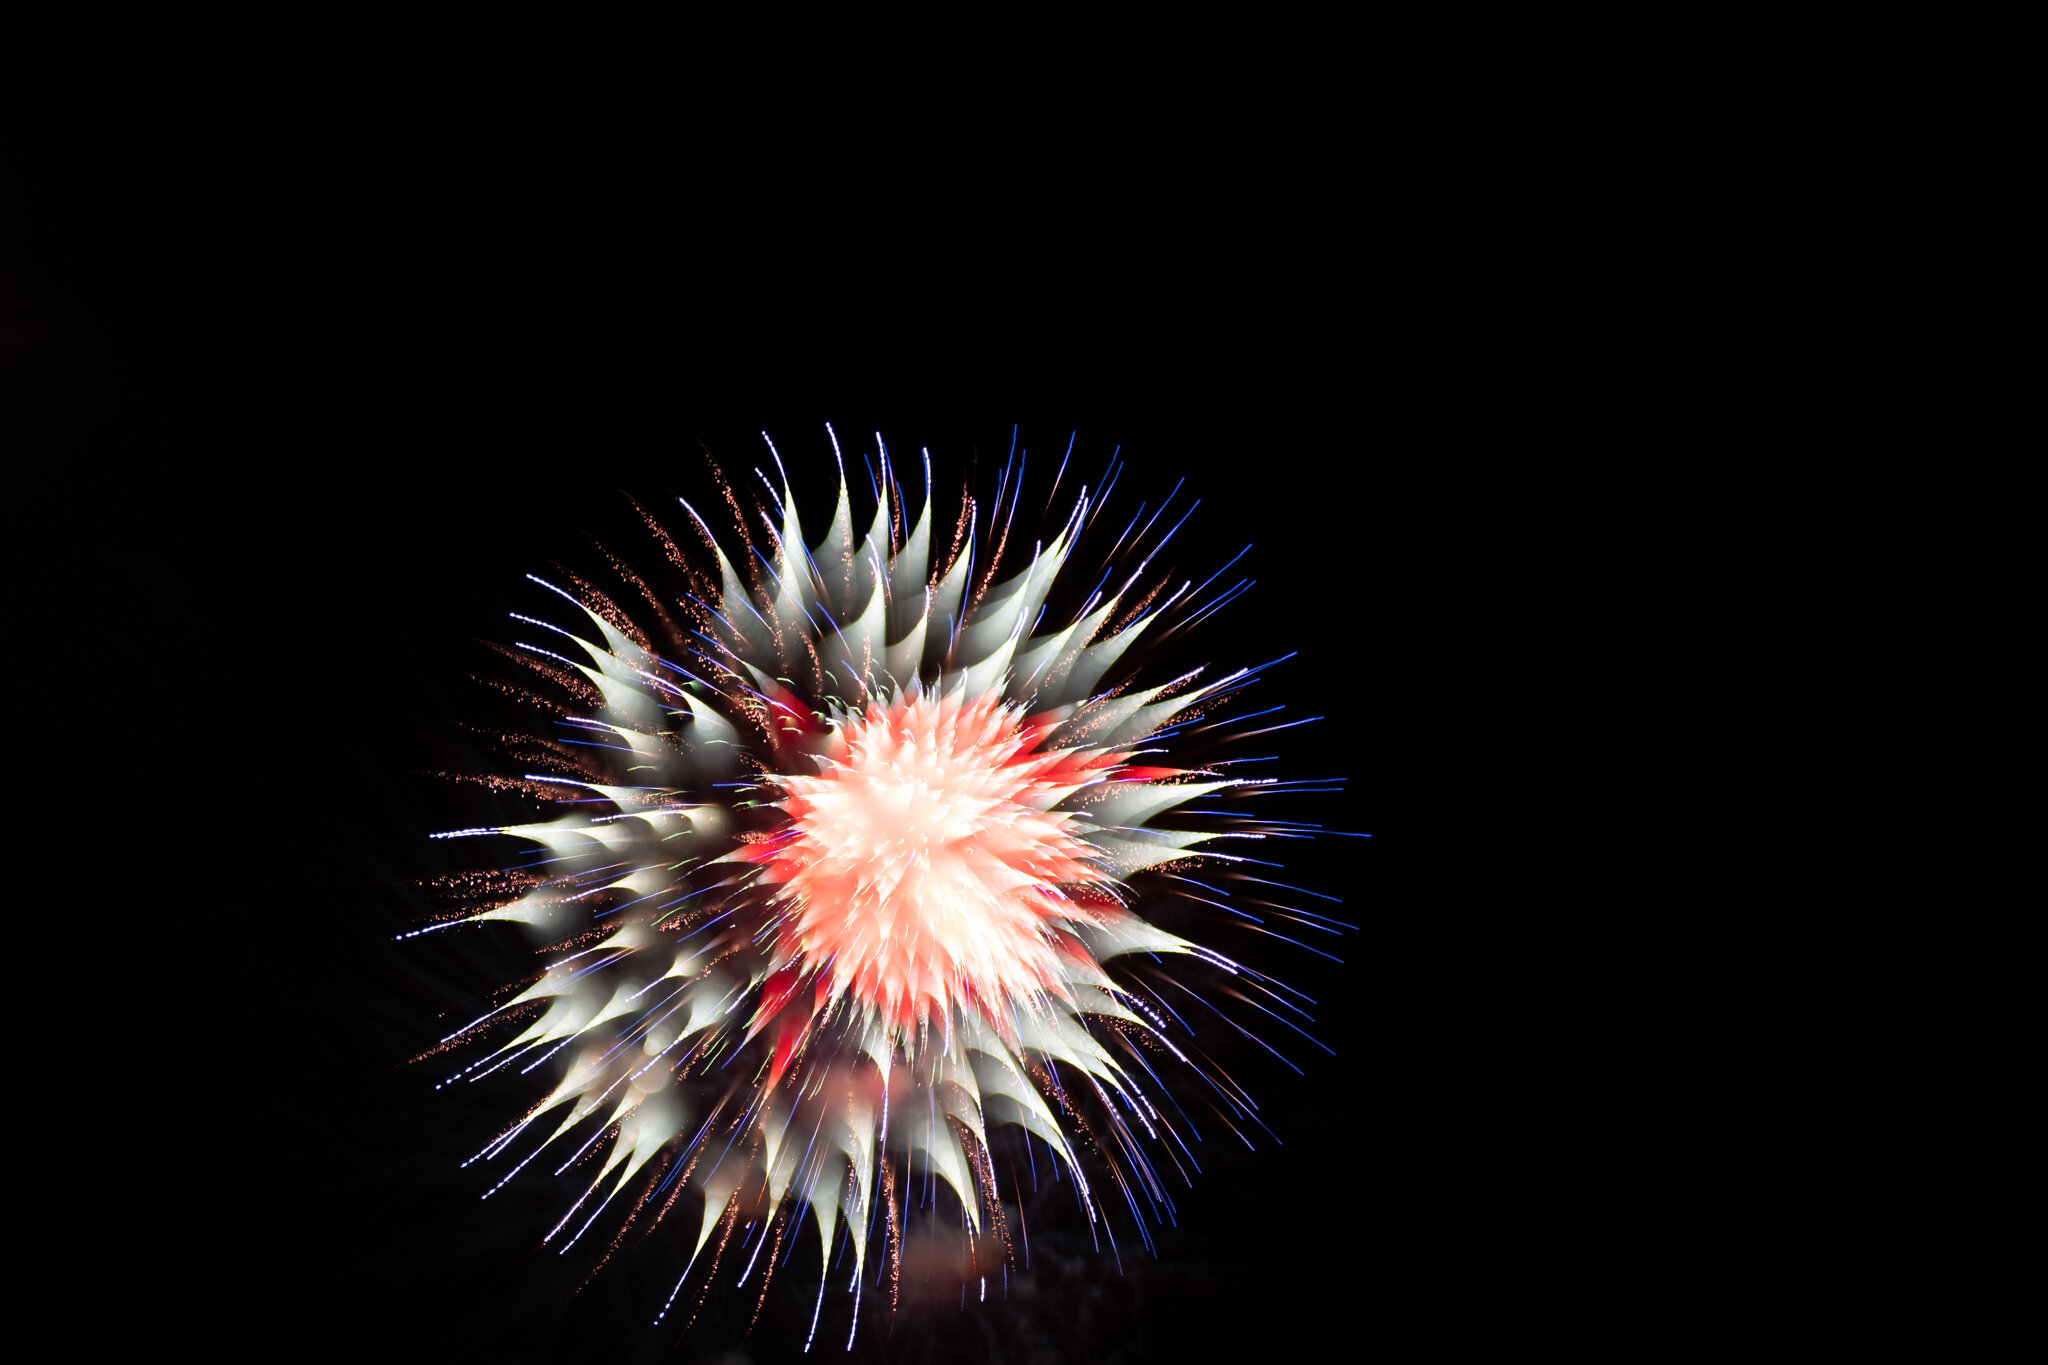 focuspulledfireworks-32.jpg